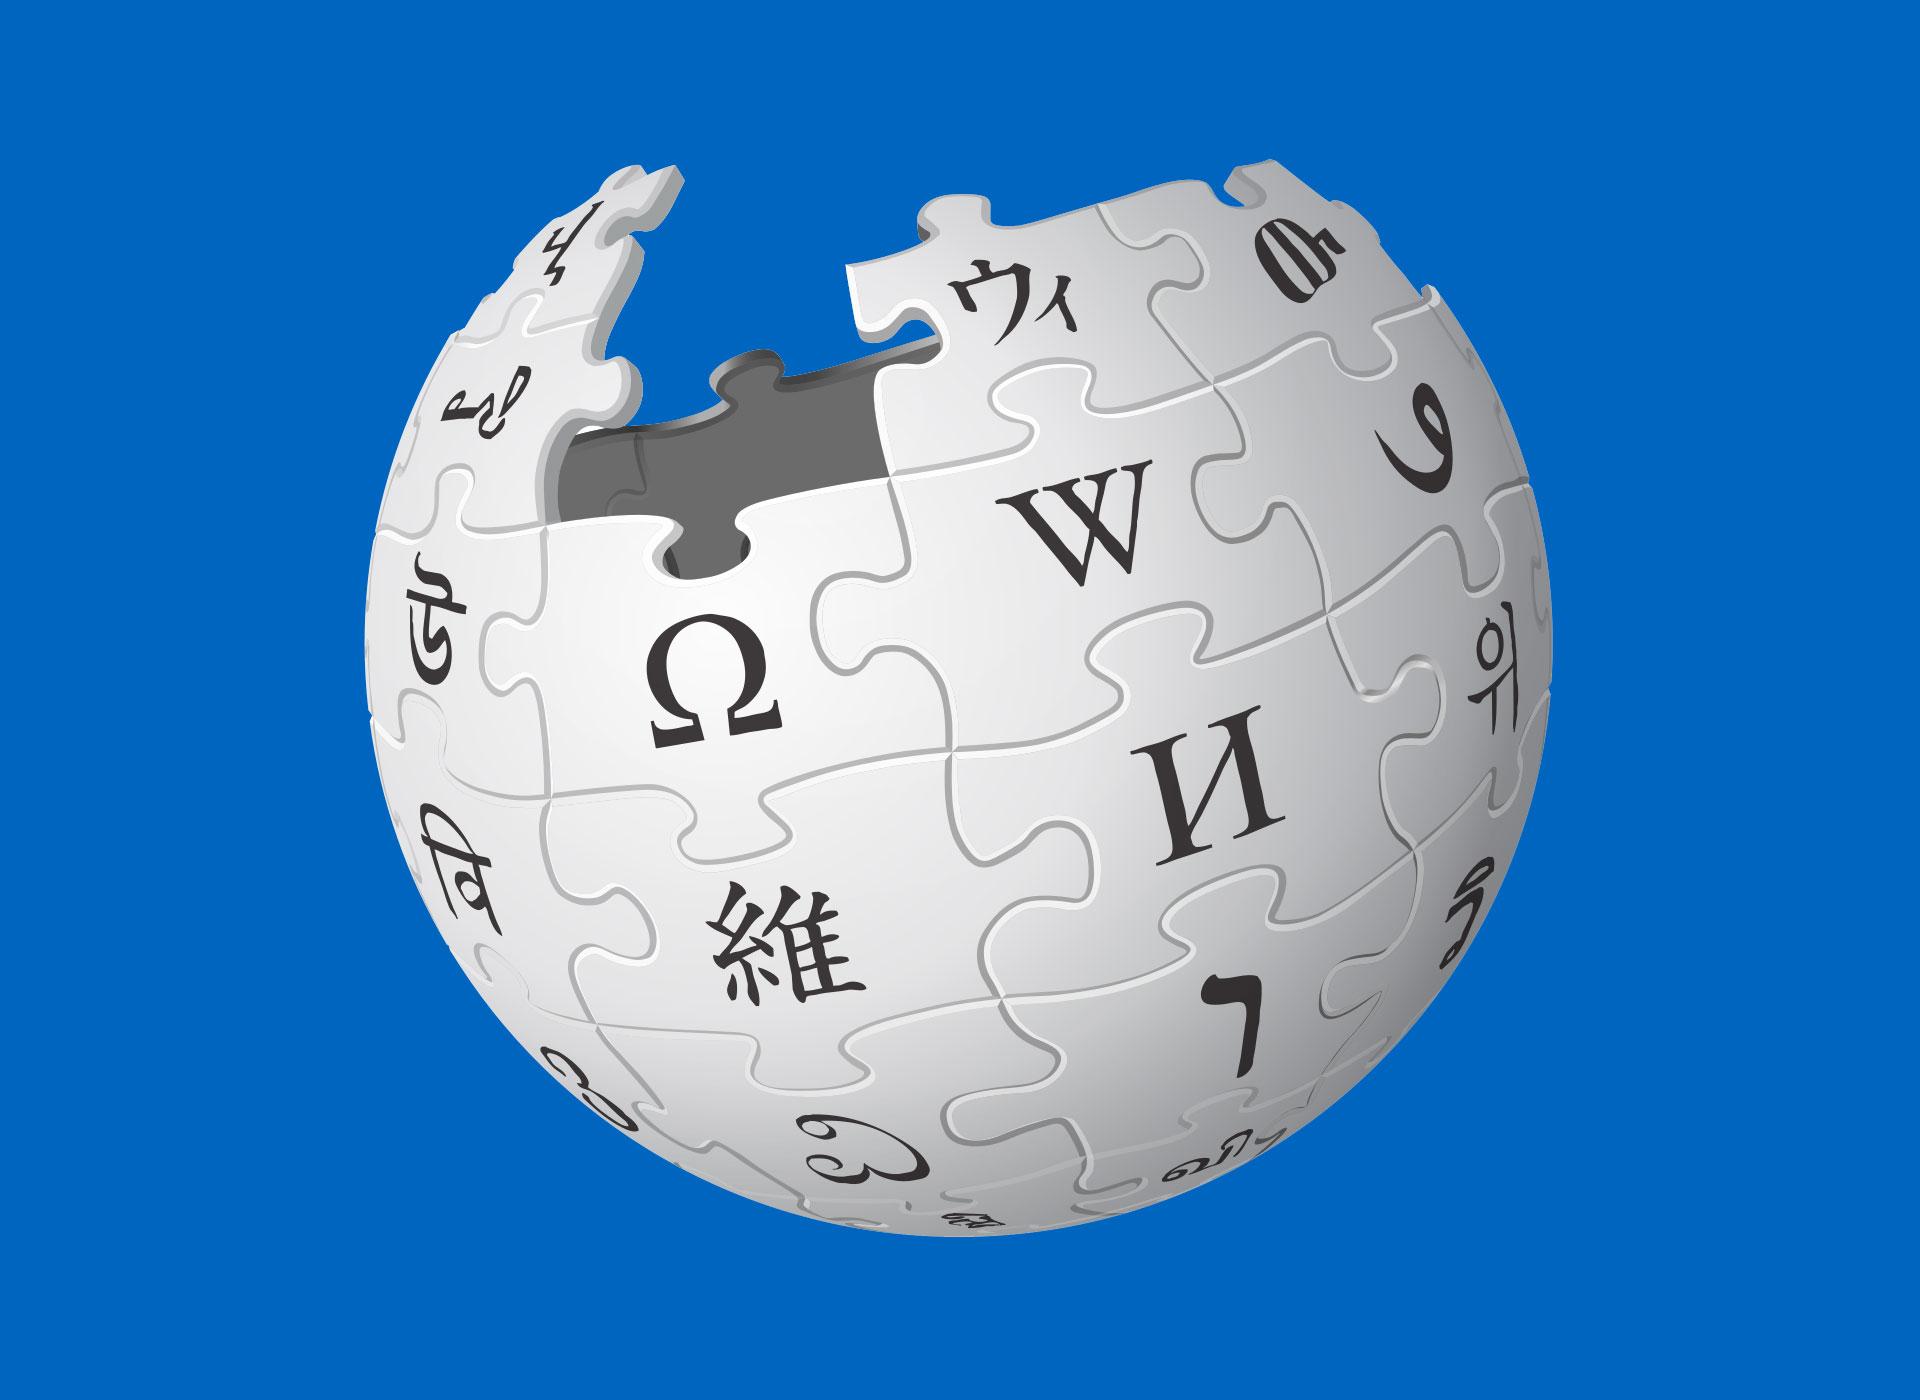 Majority of Scots Wikipedia articles are gibberish due to single prolific editor